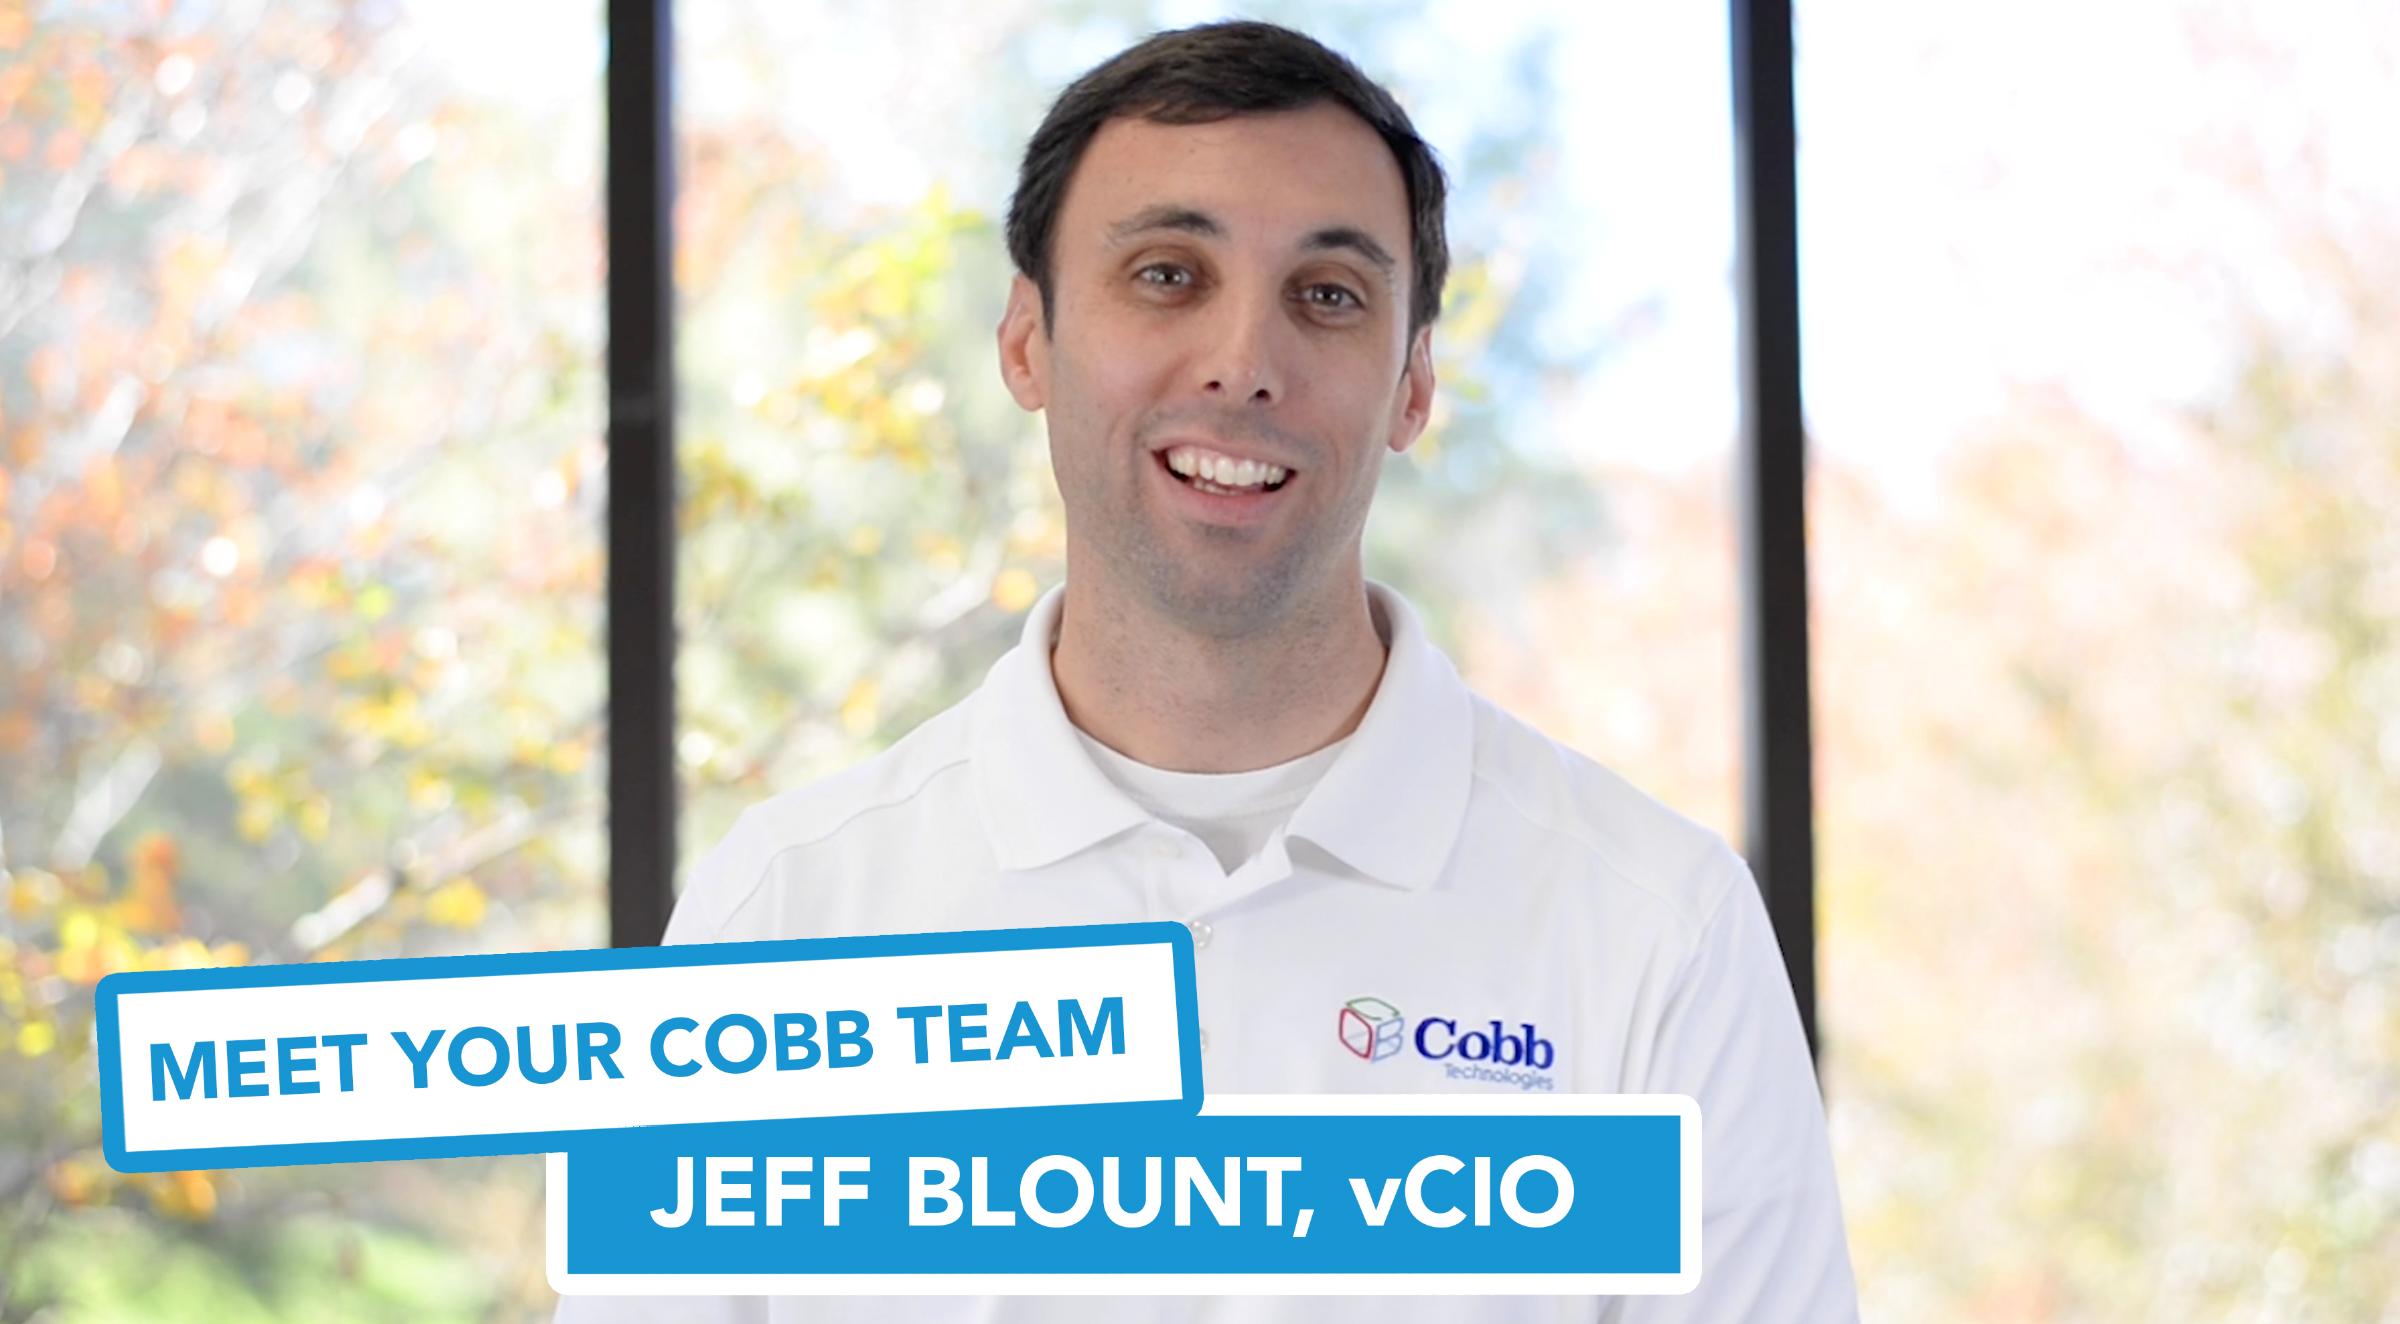 Meet Your Cobb Team: Jeff Blount, vCIO